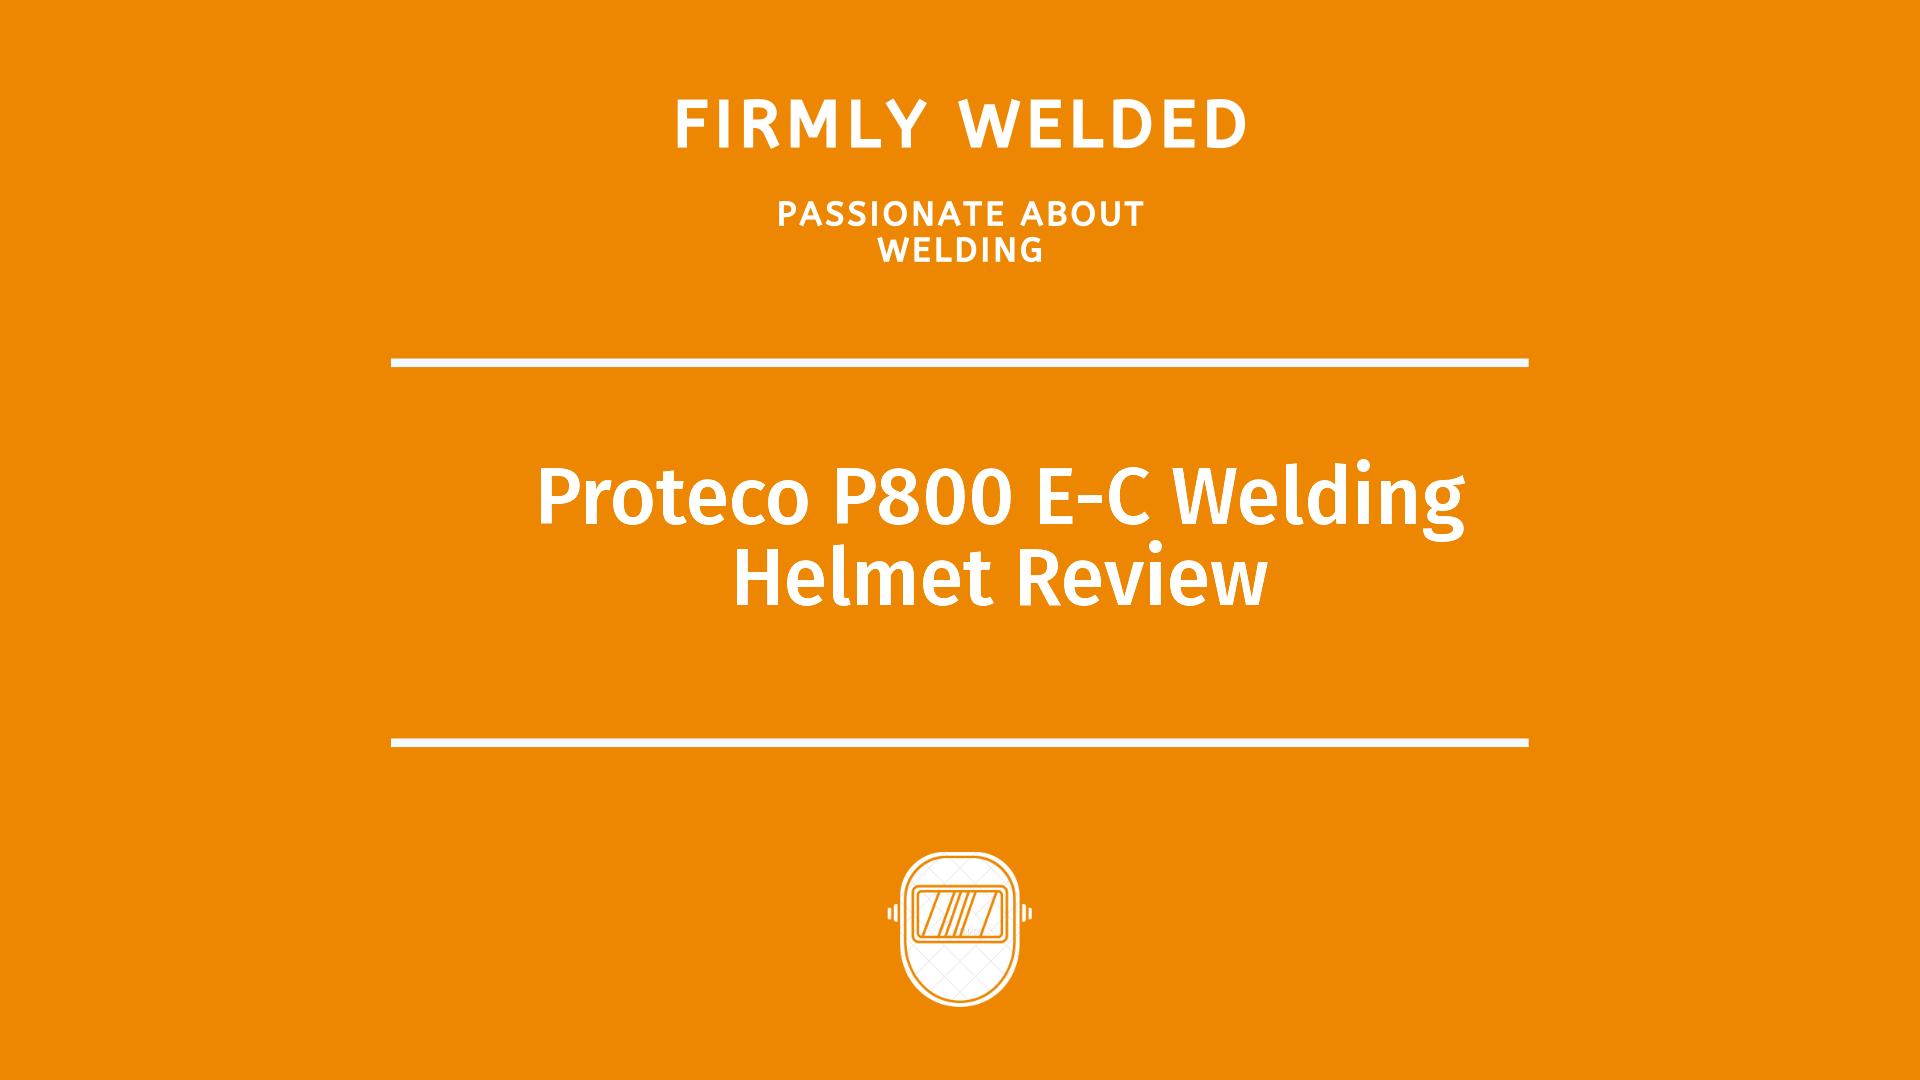 Proteco P800 E-C Welding Helmet Review